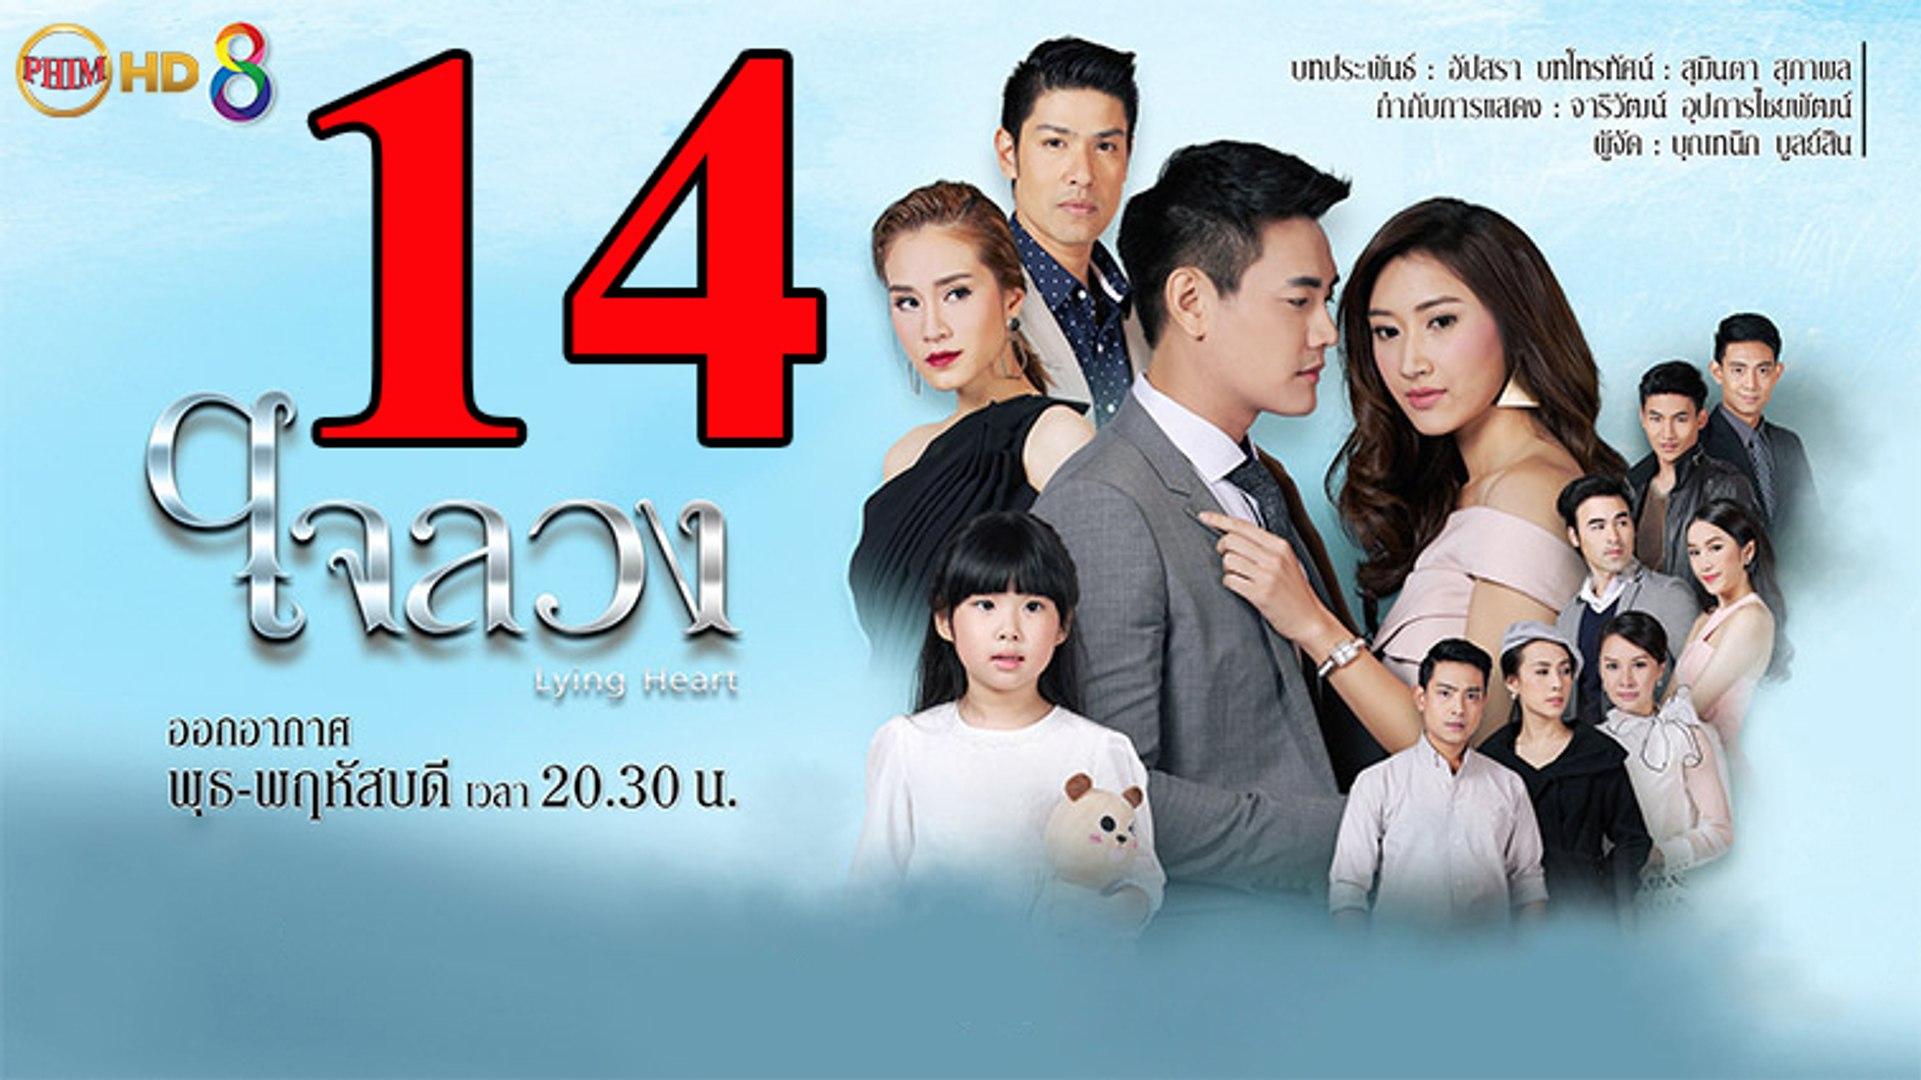 Con Tim Dối Lừa - Tập 14 - ใจลวง ตอนที่ 14 - Lying Heart EP.14 Vietsub HD 2017